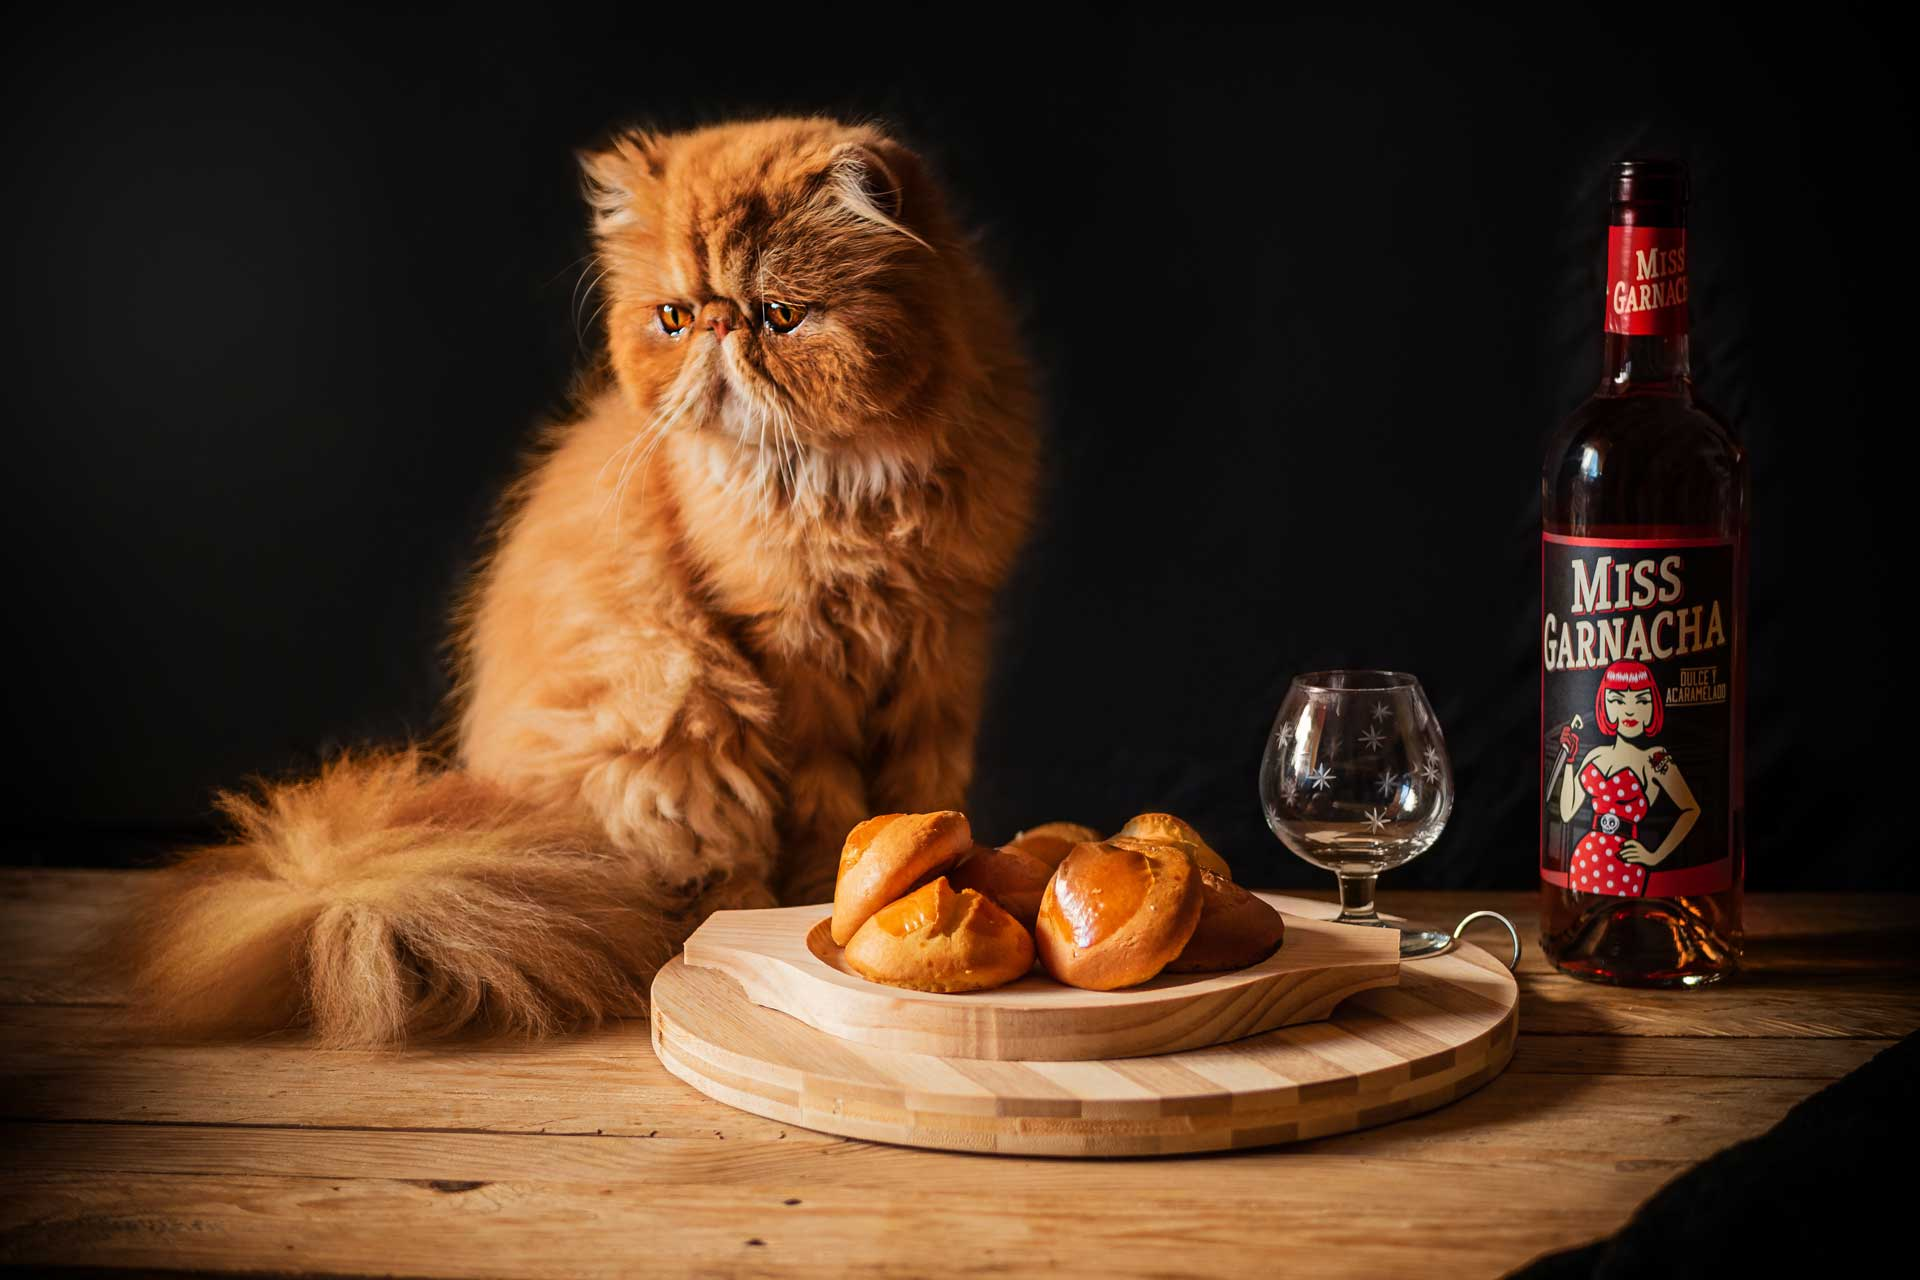 bodegón panes, vino y gato persa